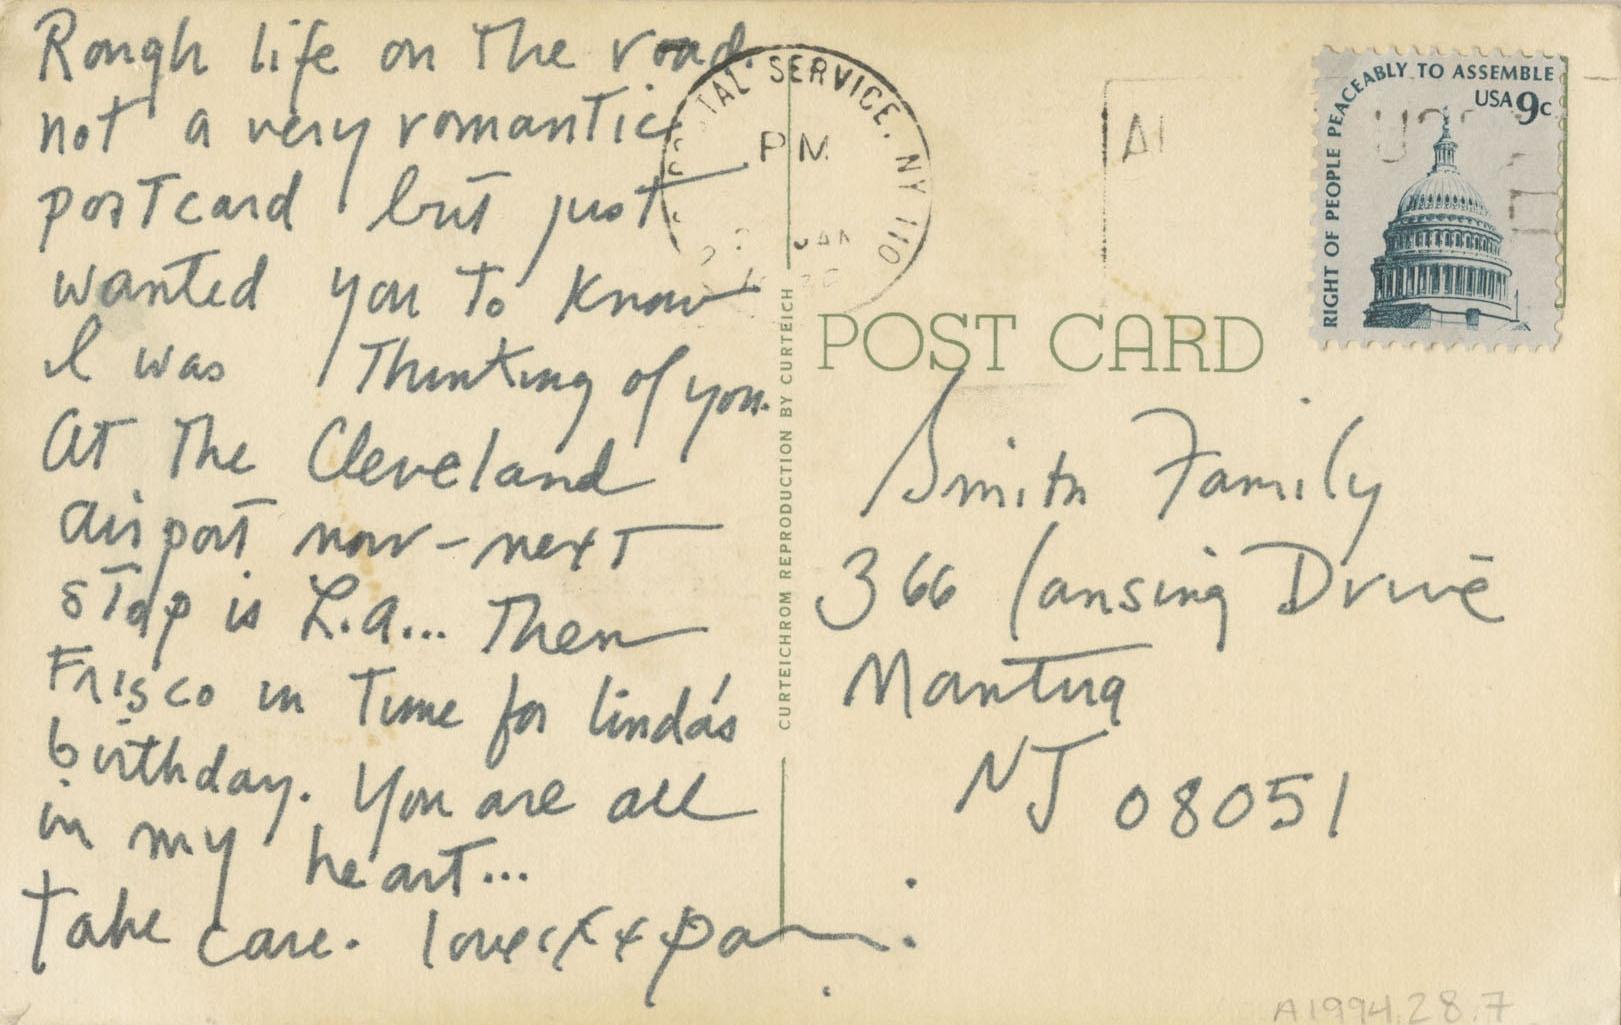 Postcard from Patti Smith